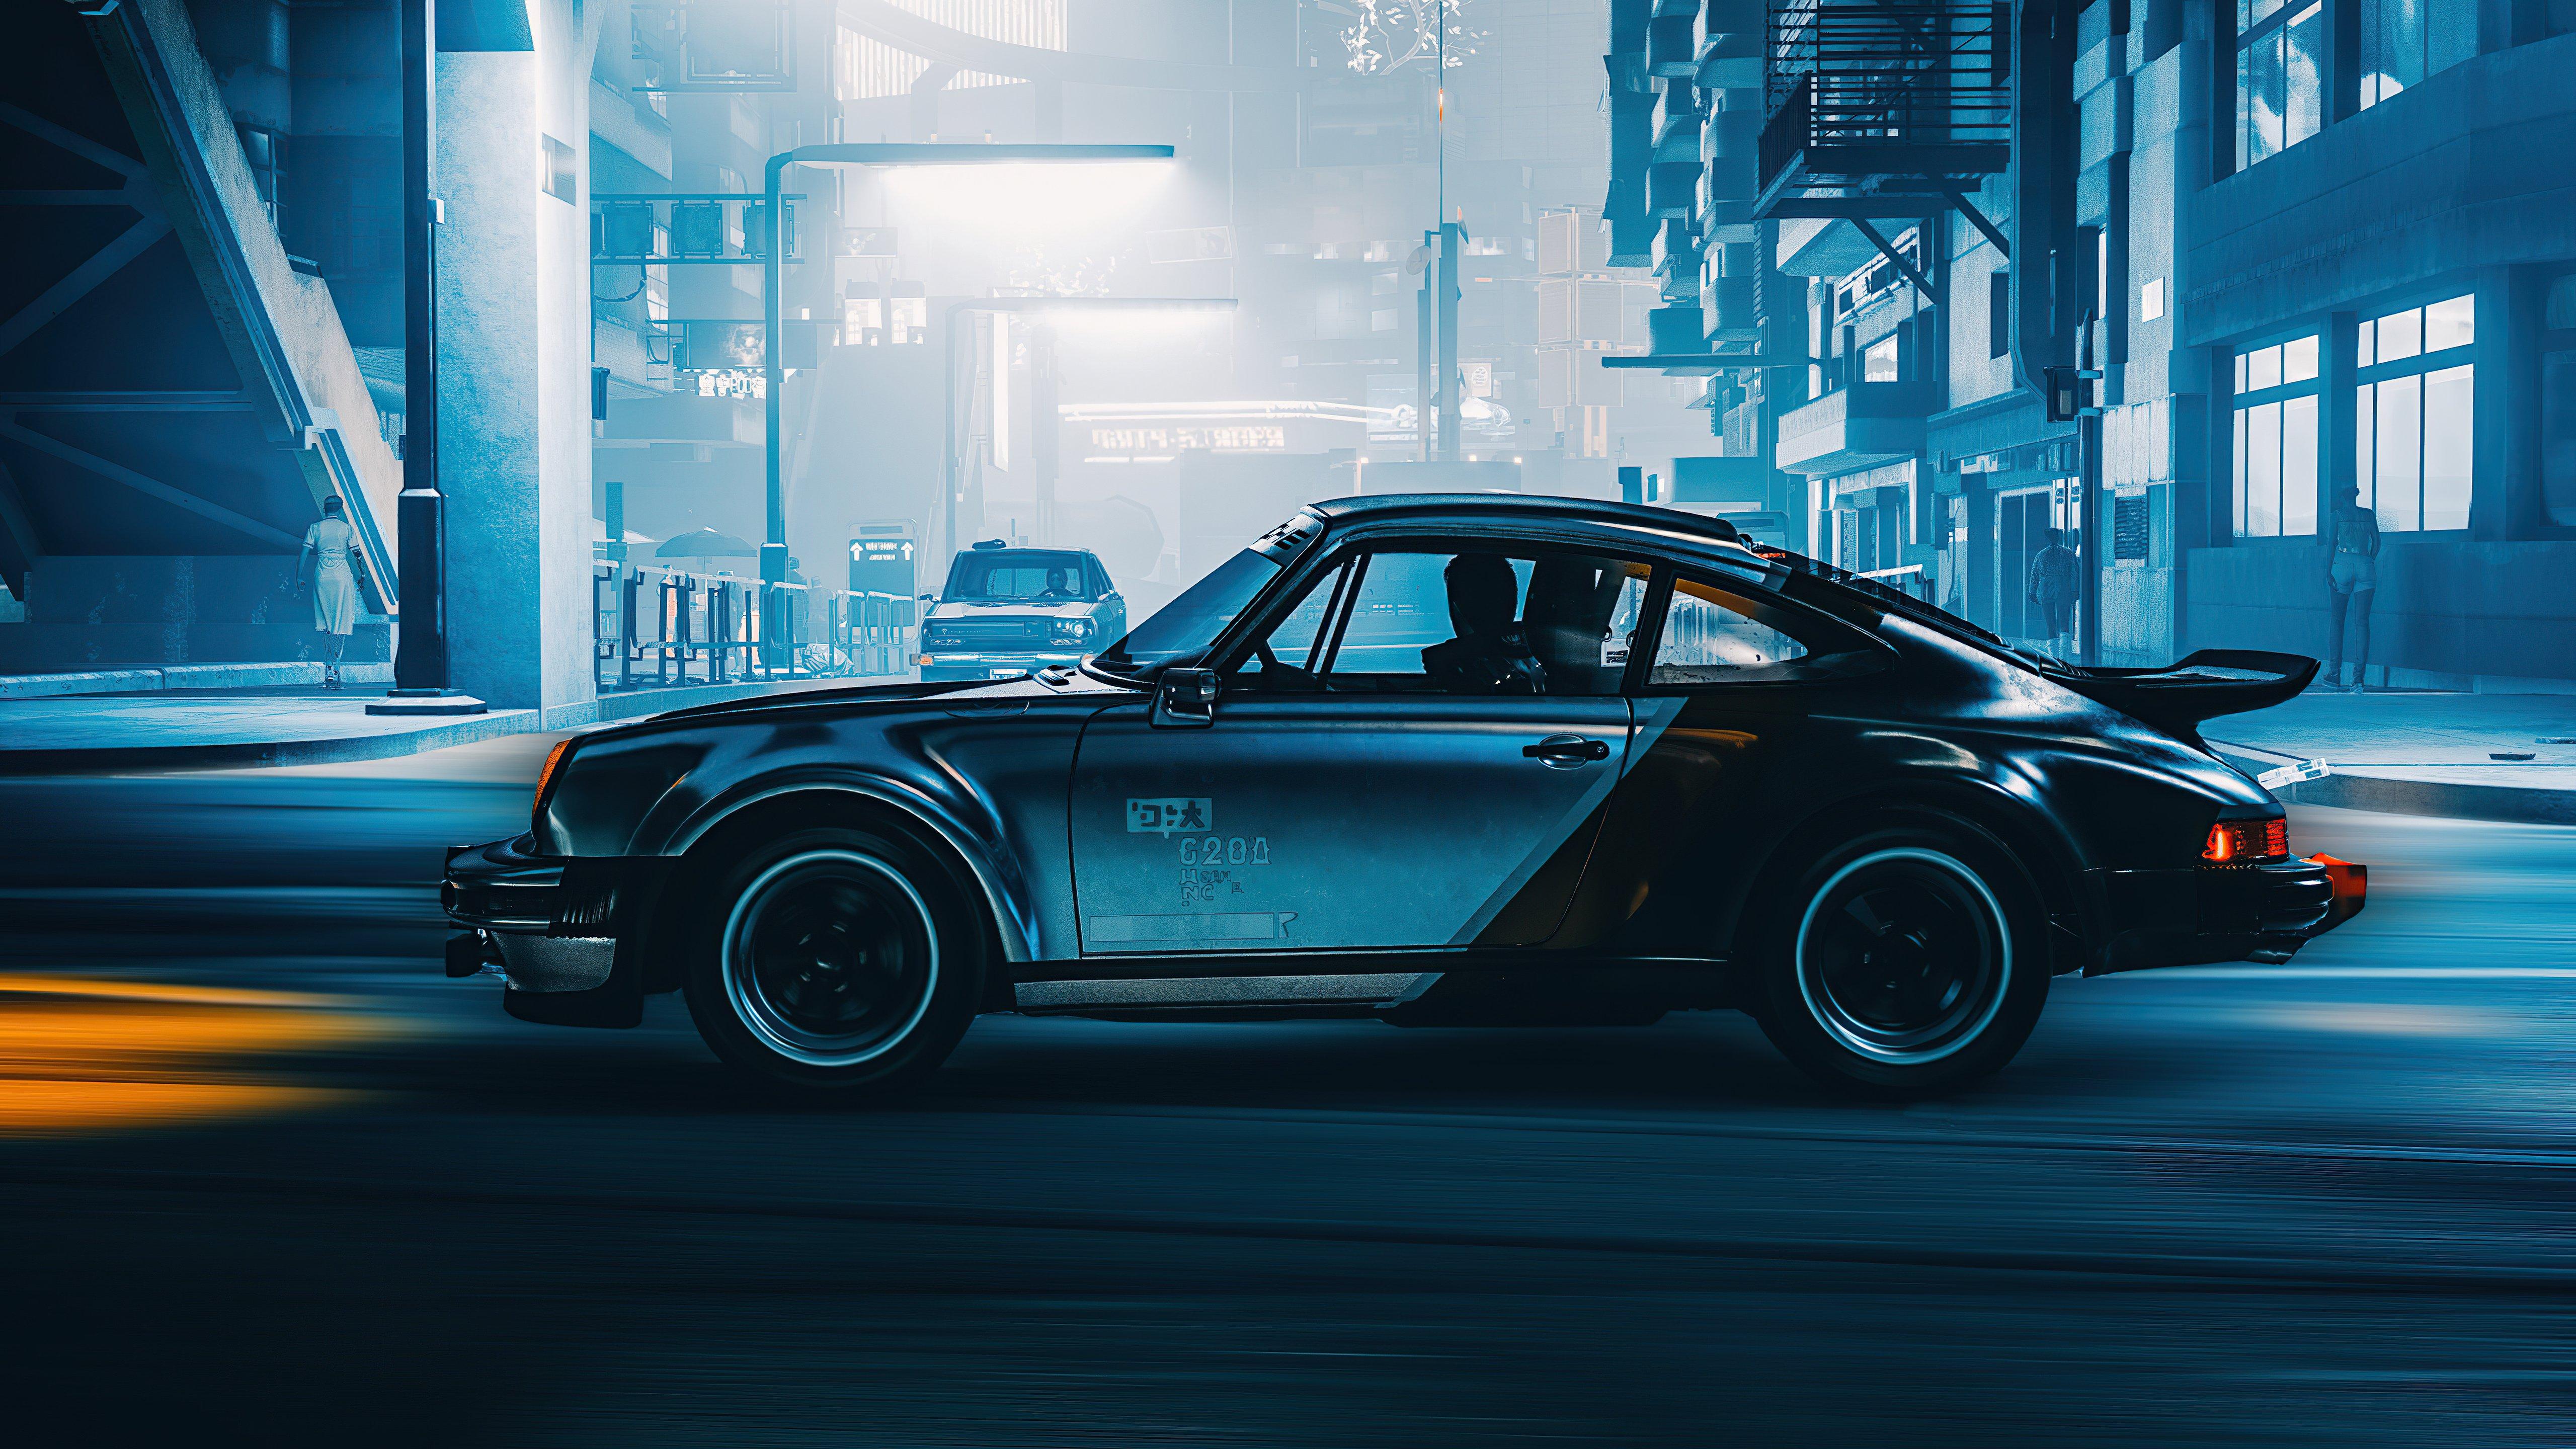 Fondos de pantalla Silverhand Porsche Cyberpunk 2077